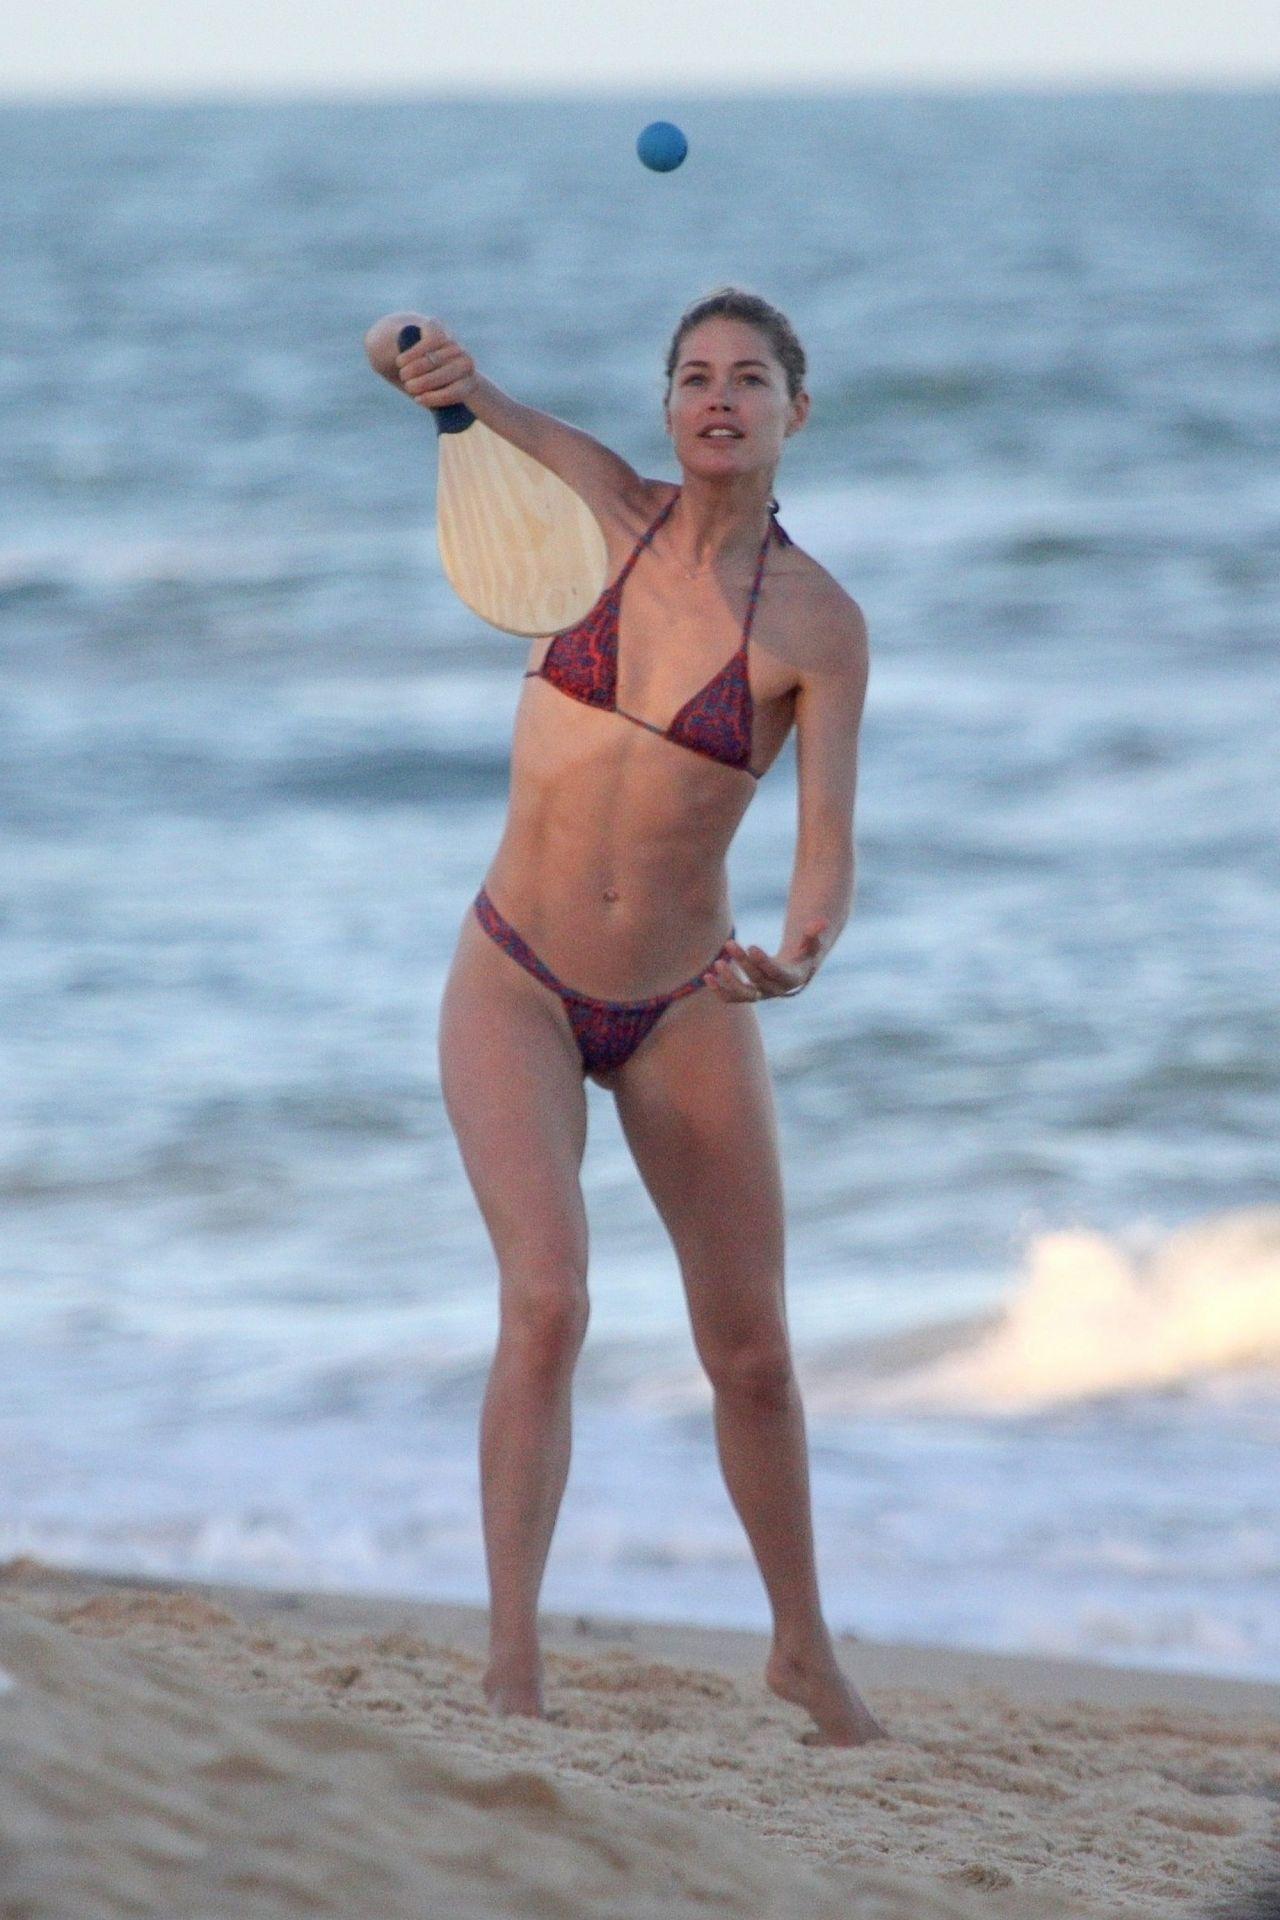 Doutzen Kroes In Bikini Bahia Beach In Brazil